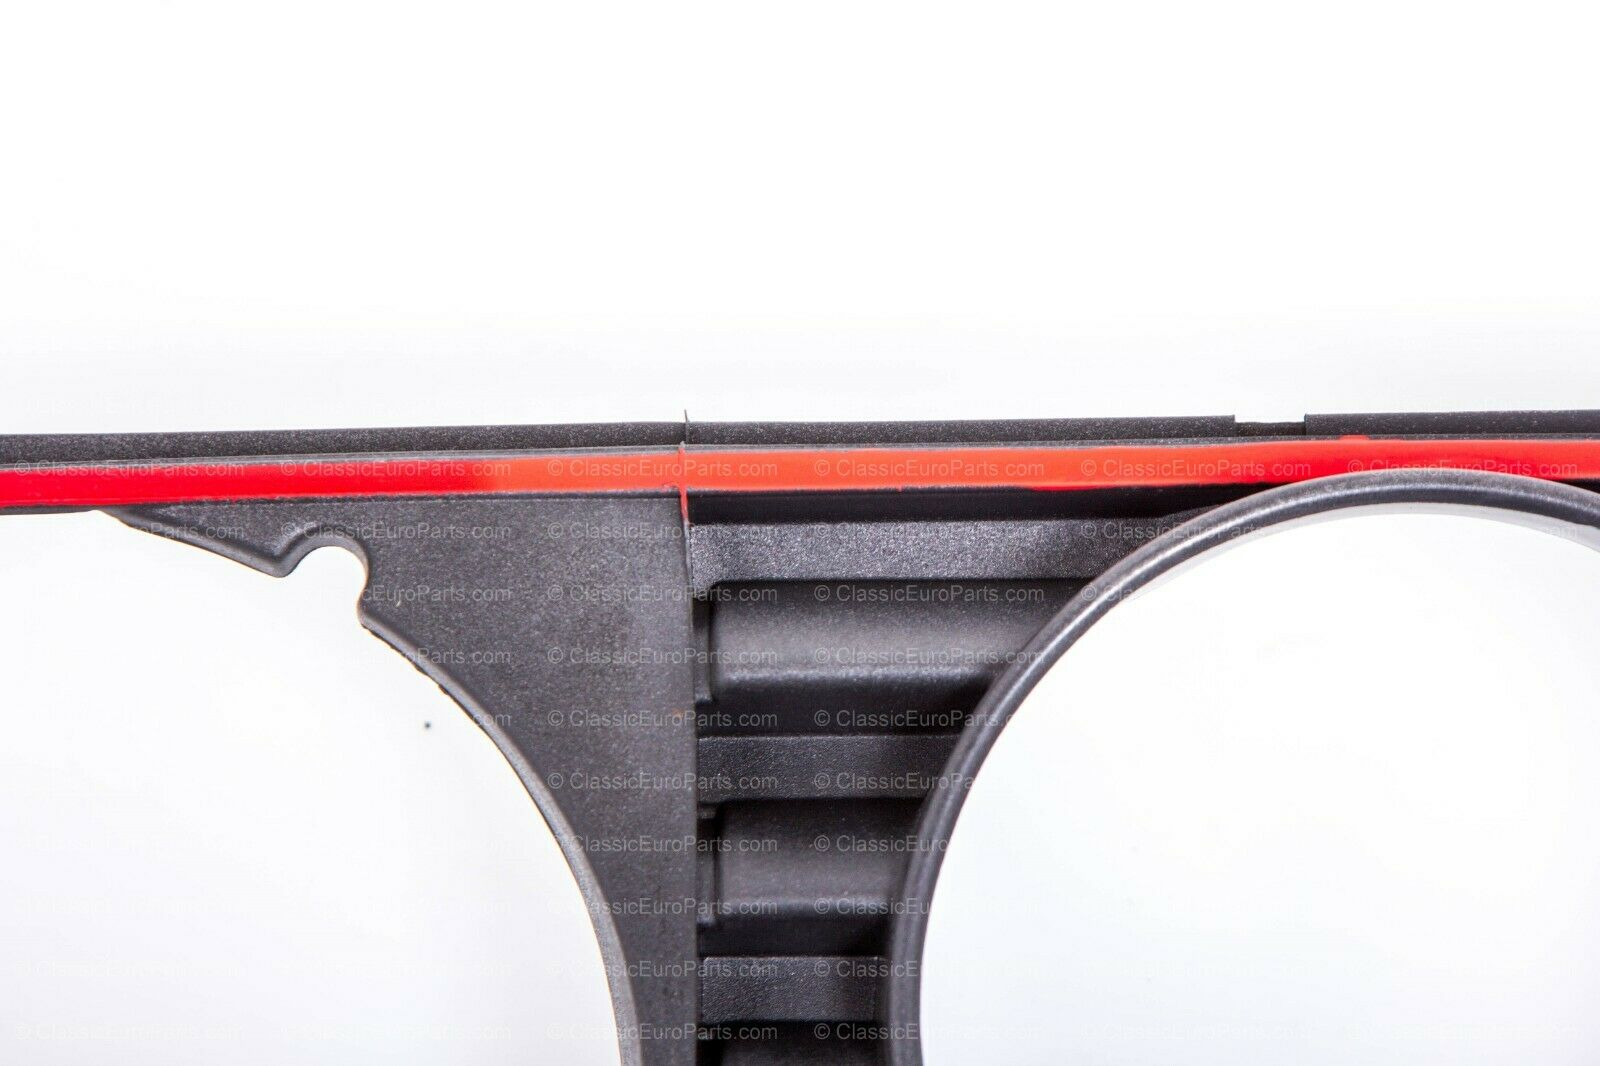 vw golf rabbit mk2 euro gti quad headlight grill. Black Bedroom Furniture Sets. Home Design Ideas